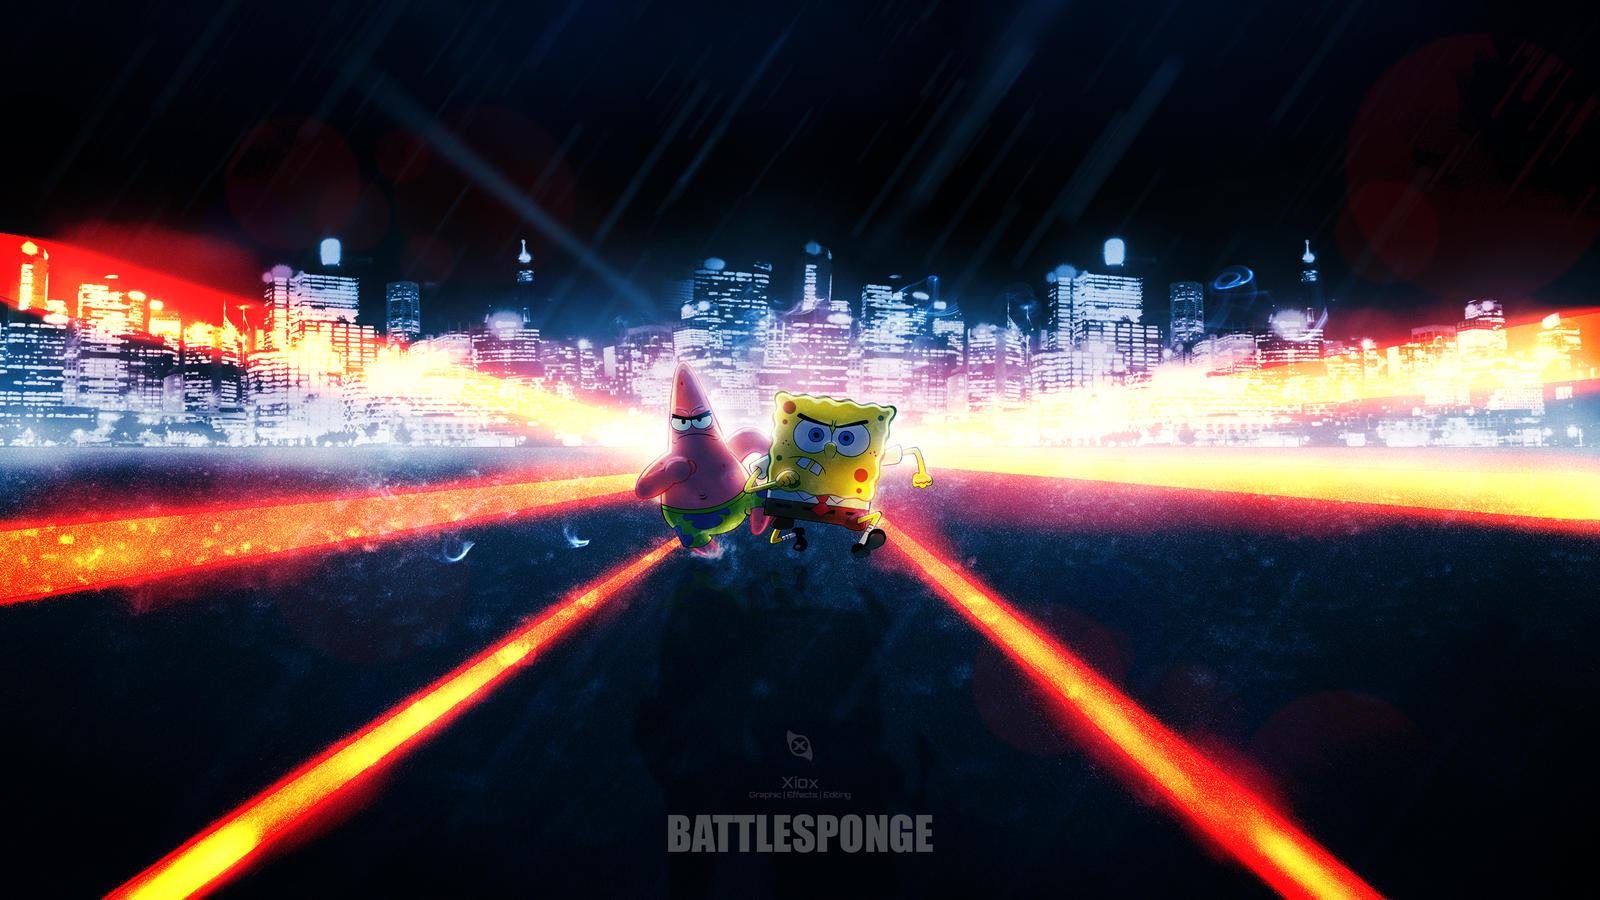 BattleSponge by Xiox231